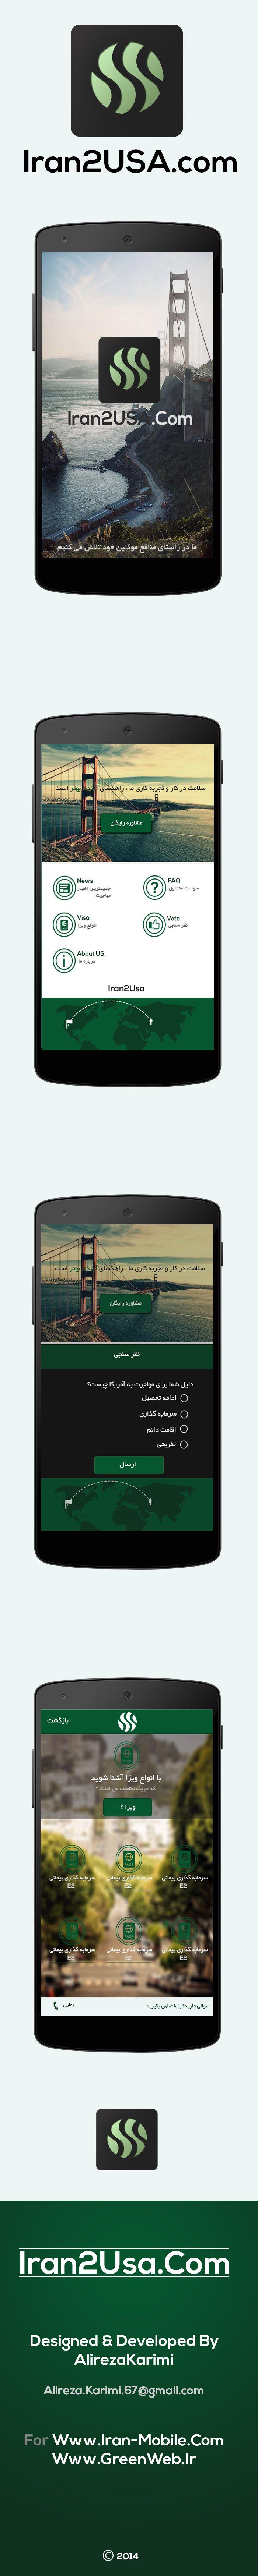 iran2usa com android application